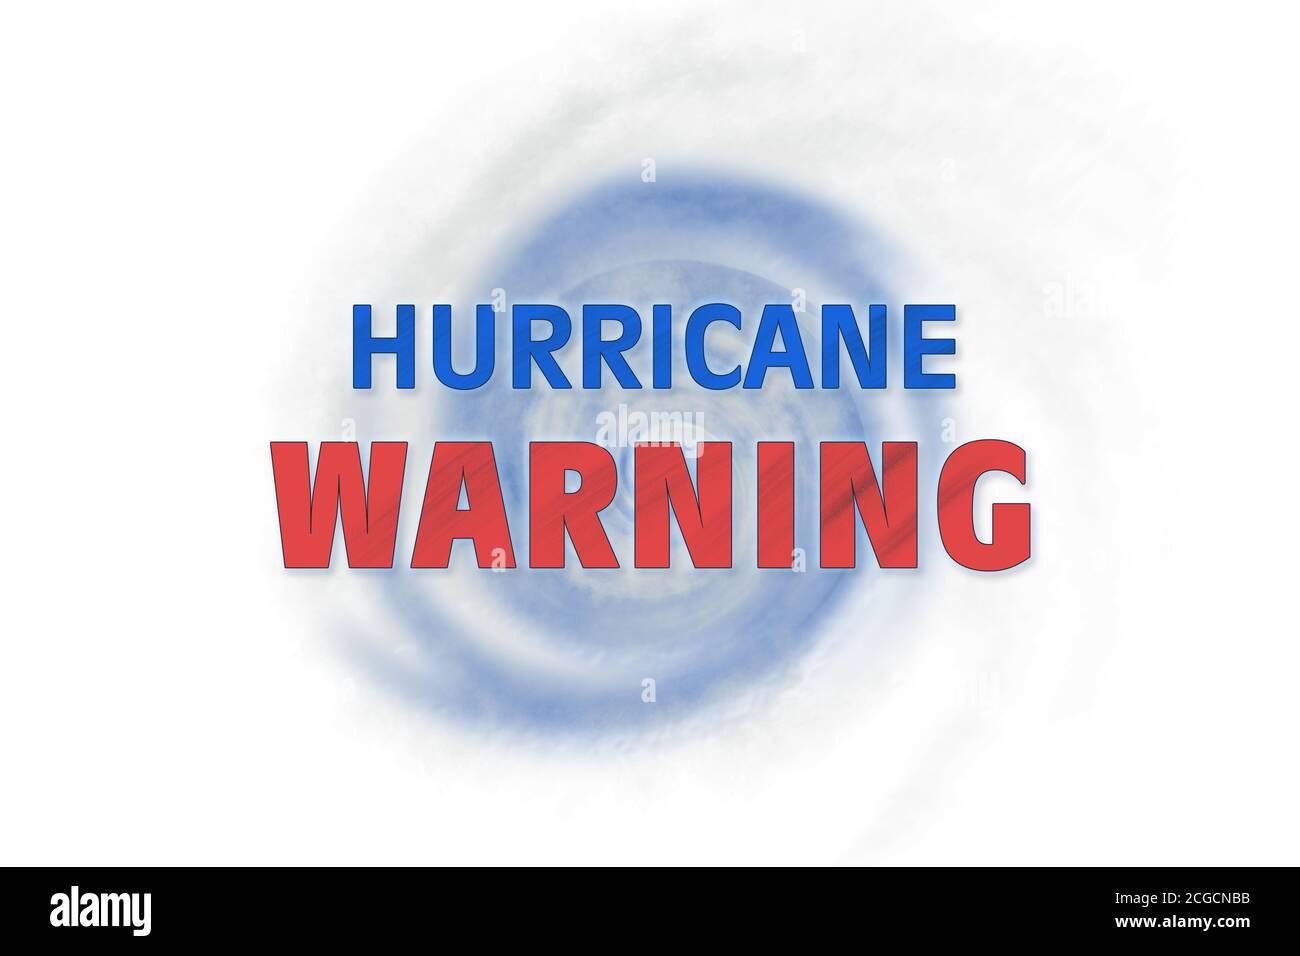 Weather illustration. Hurricane warning. Tropical storm. Stock Photo